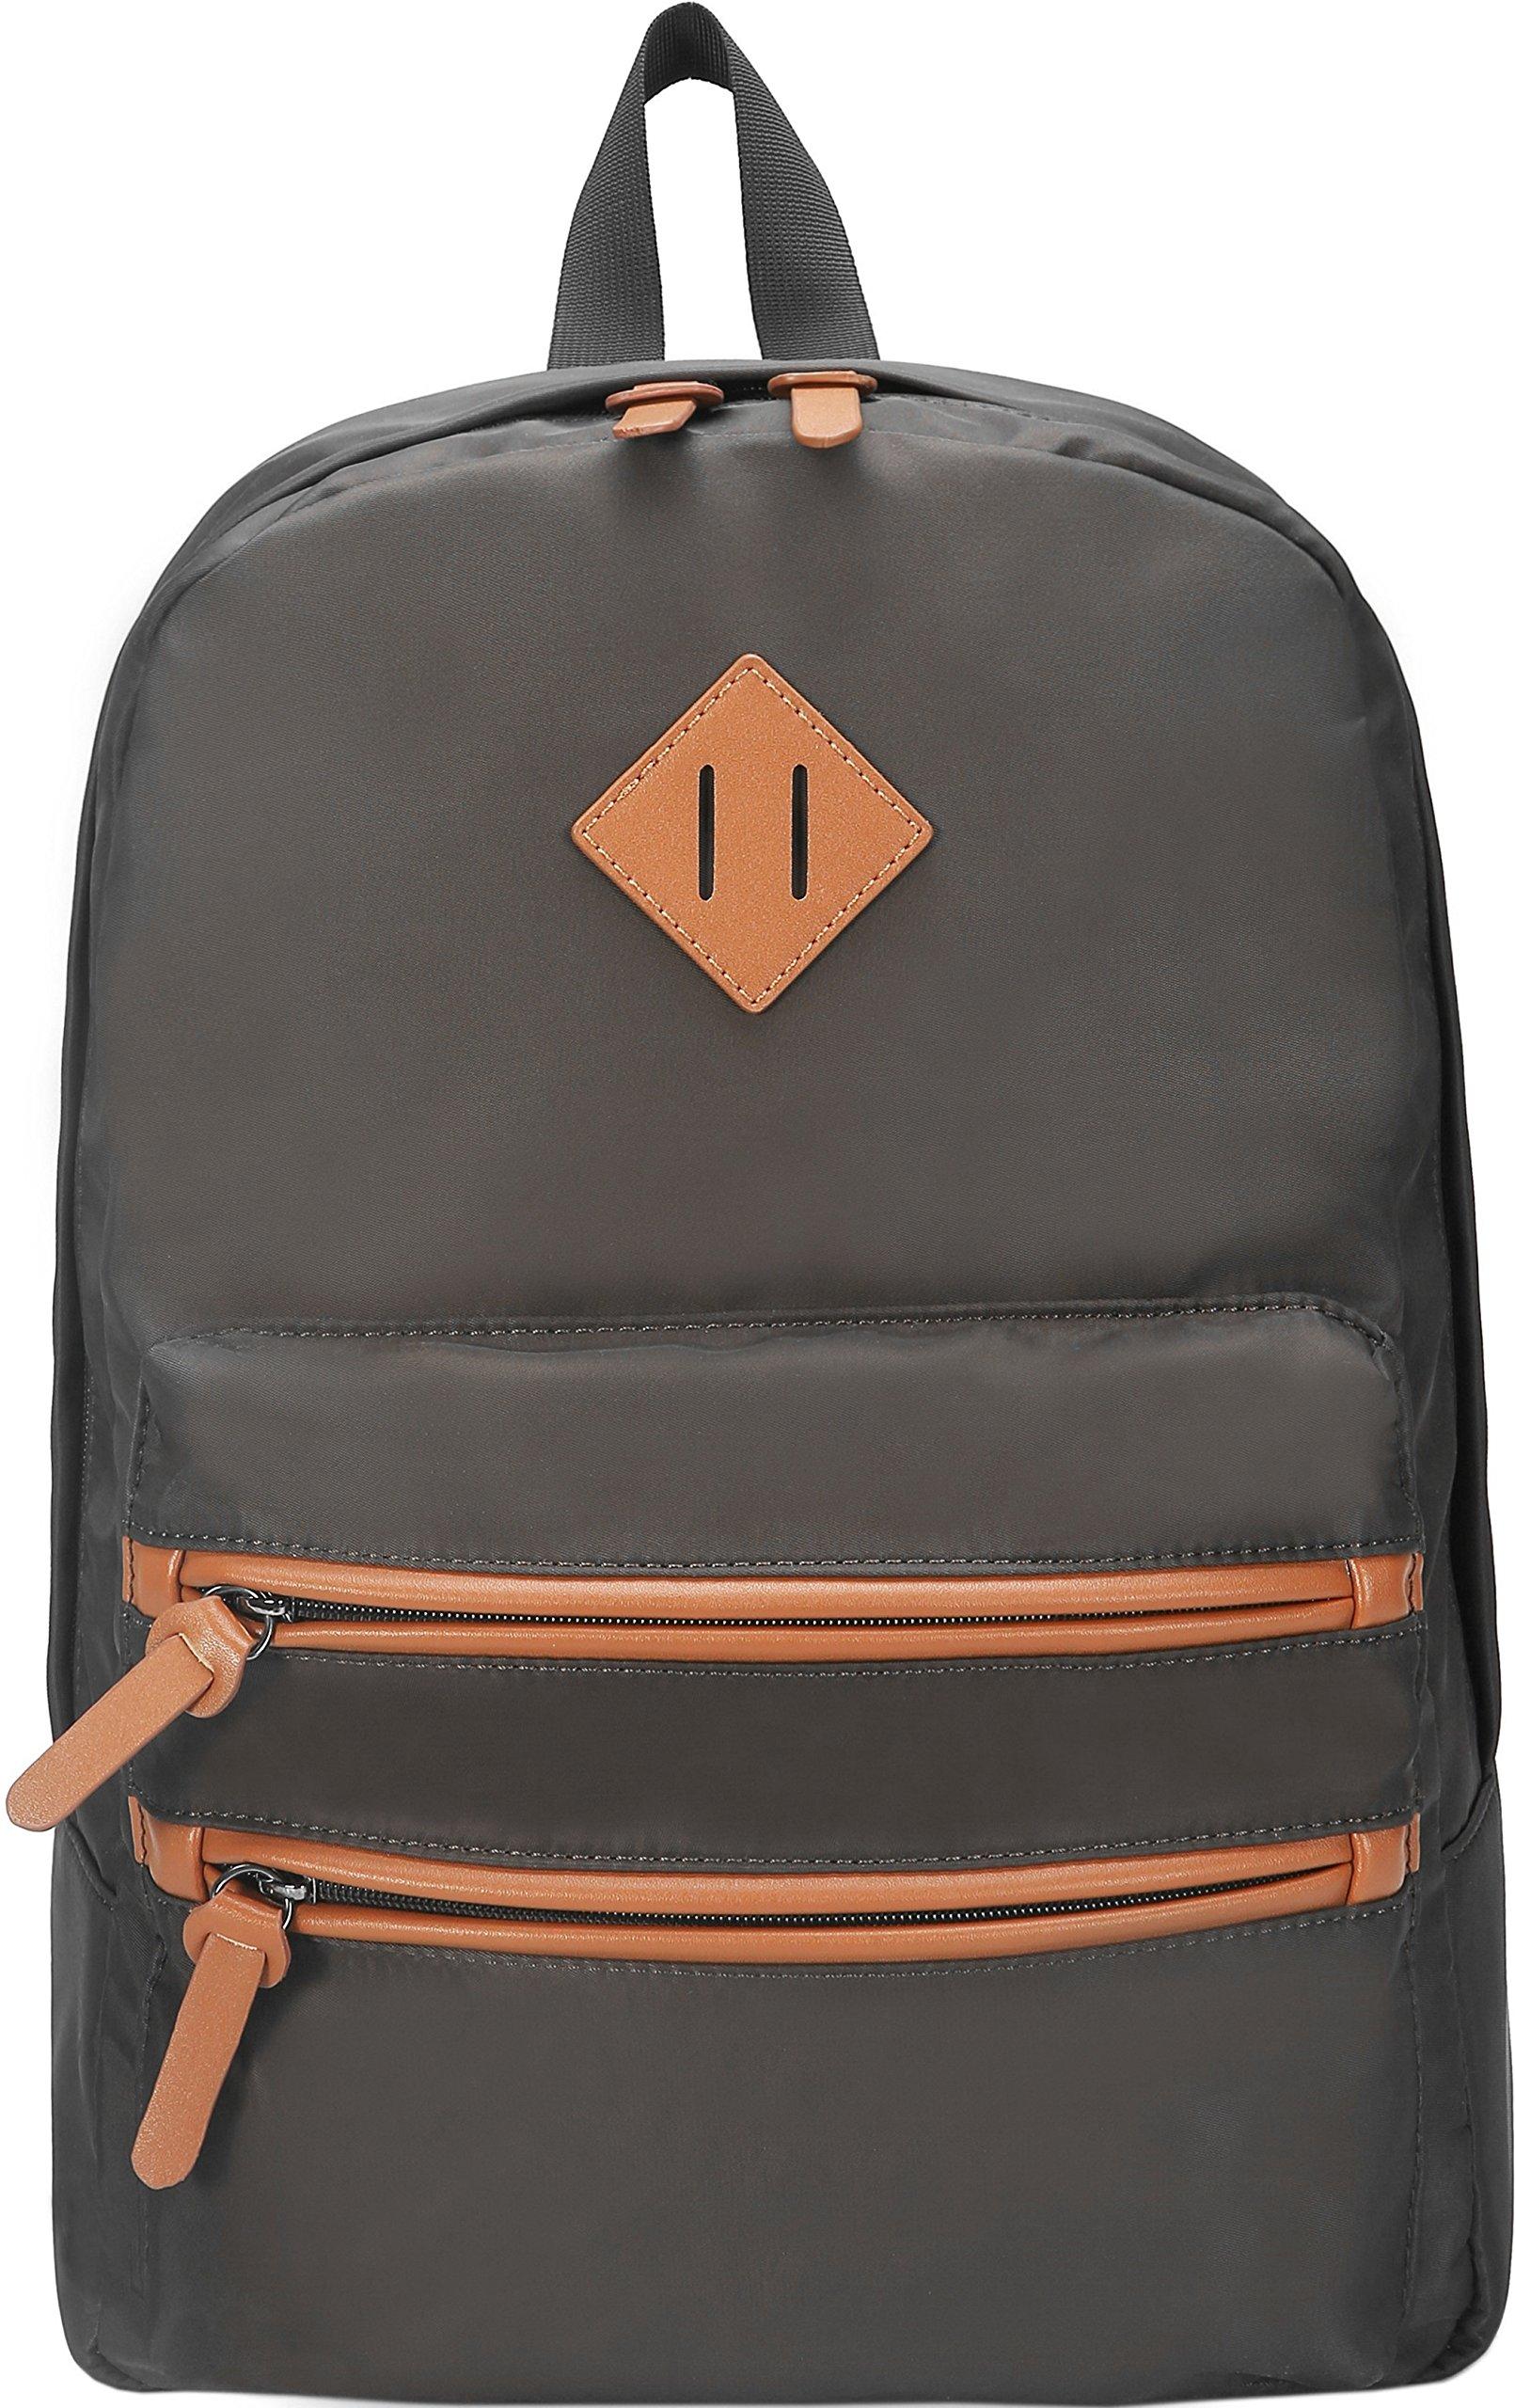 Gysan Lightweight Waterproof Travel Backpack 15 Inch Laptop for Womens Mens Boys Girls College School Bookbags, Coffee